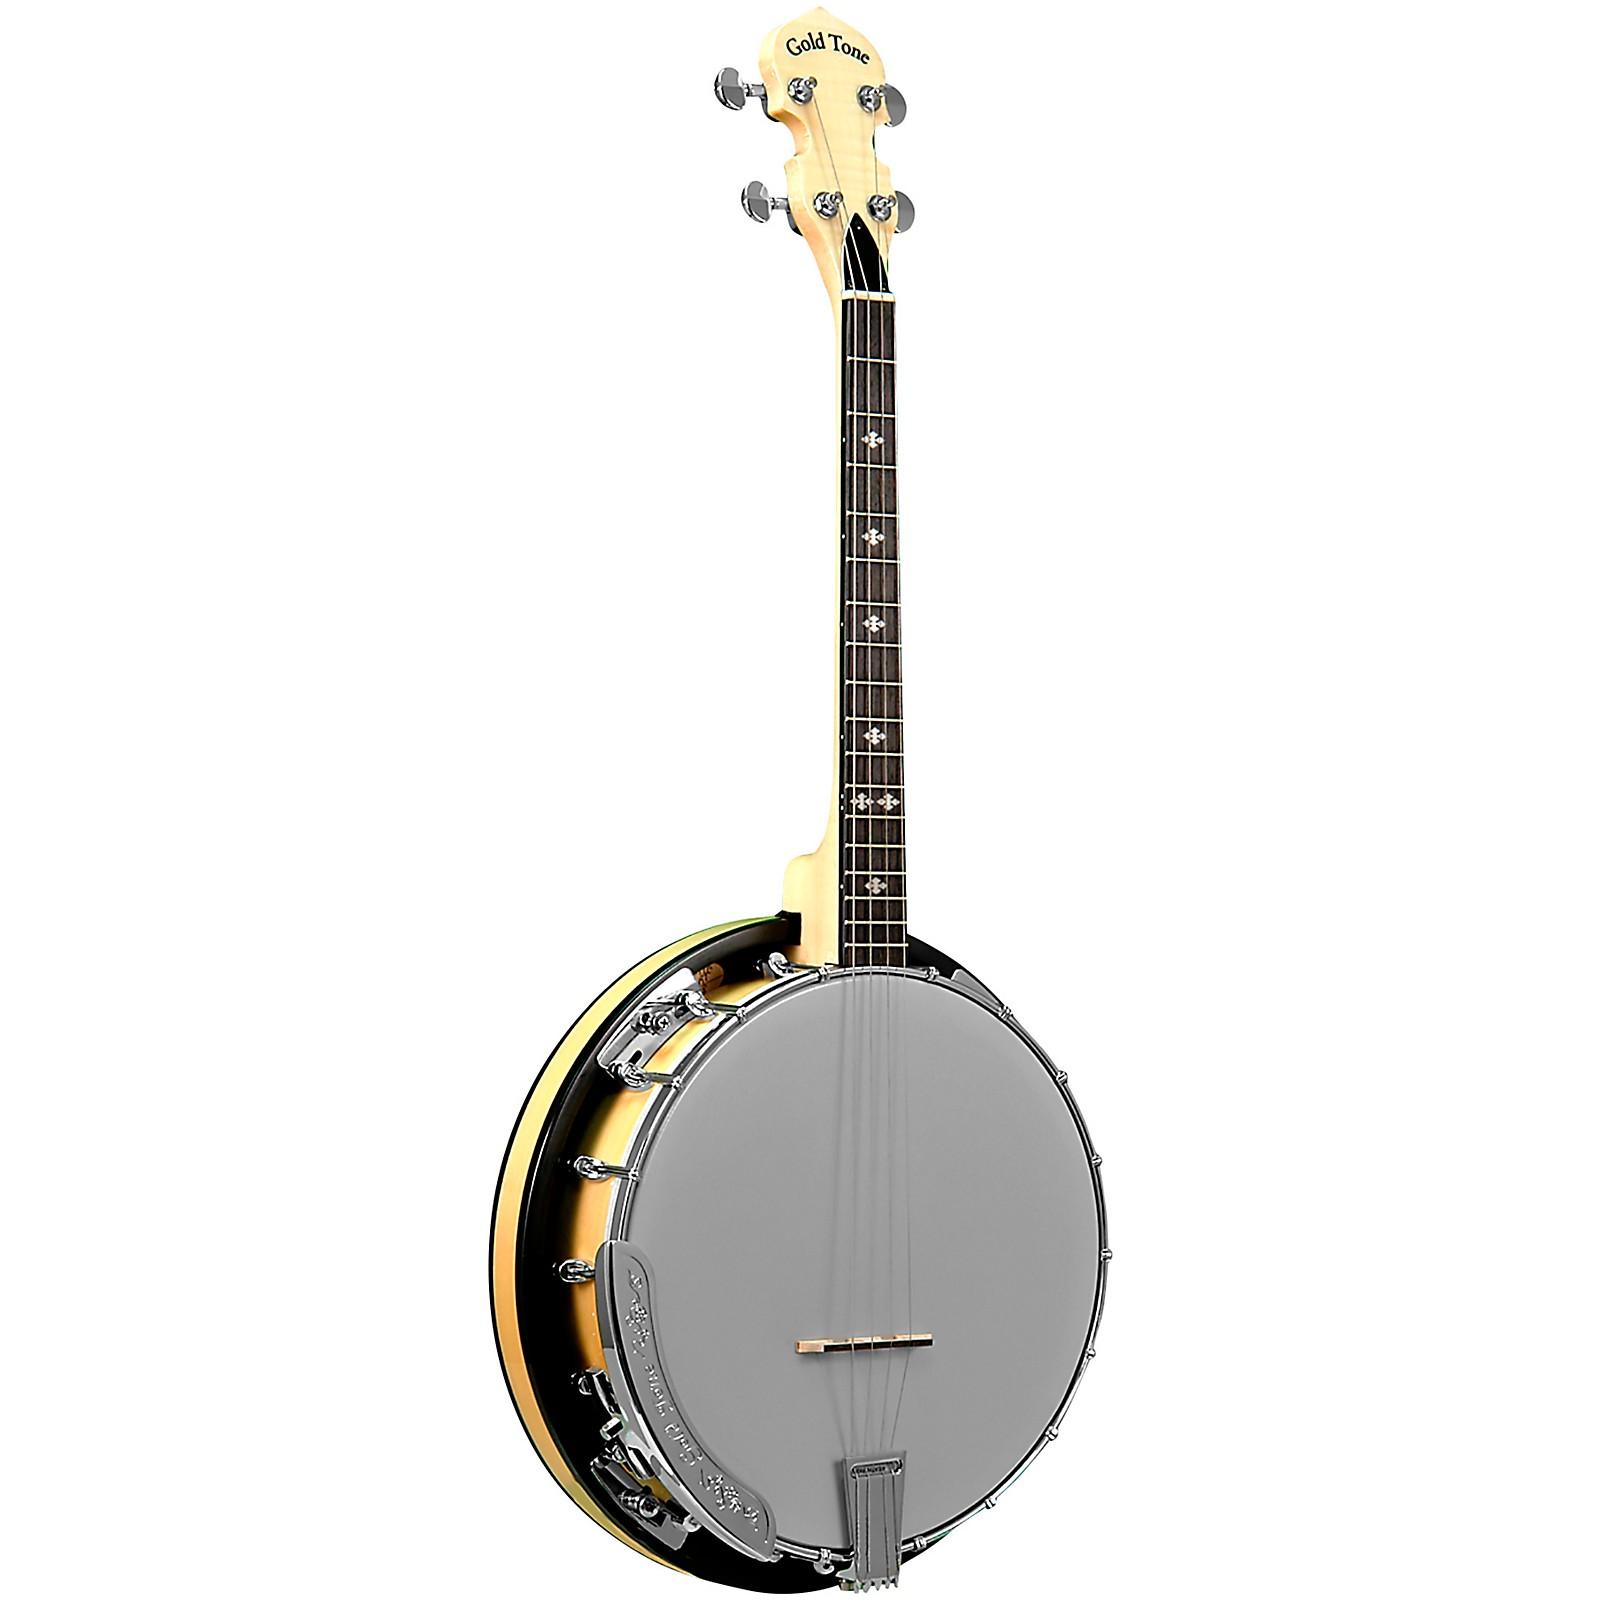 Gold Tone Cripple Creek Left-Handed Irish Tenor Banjo